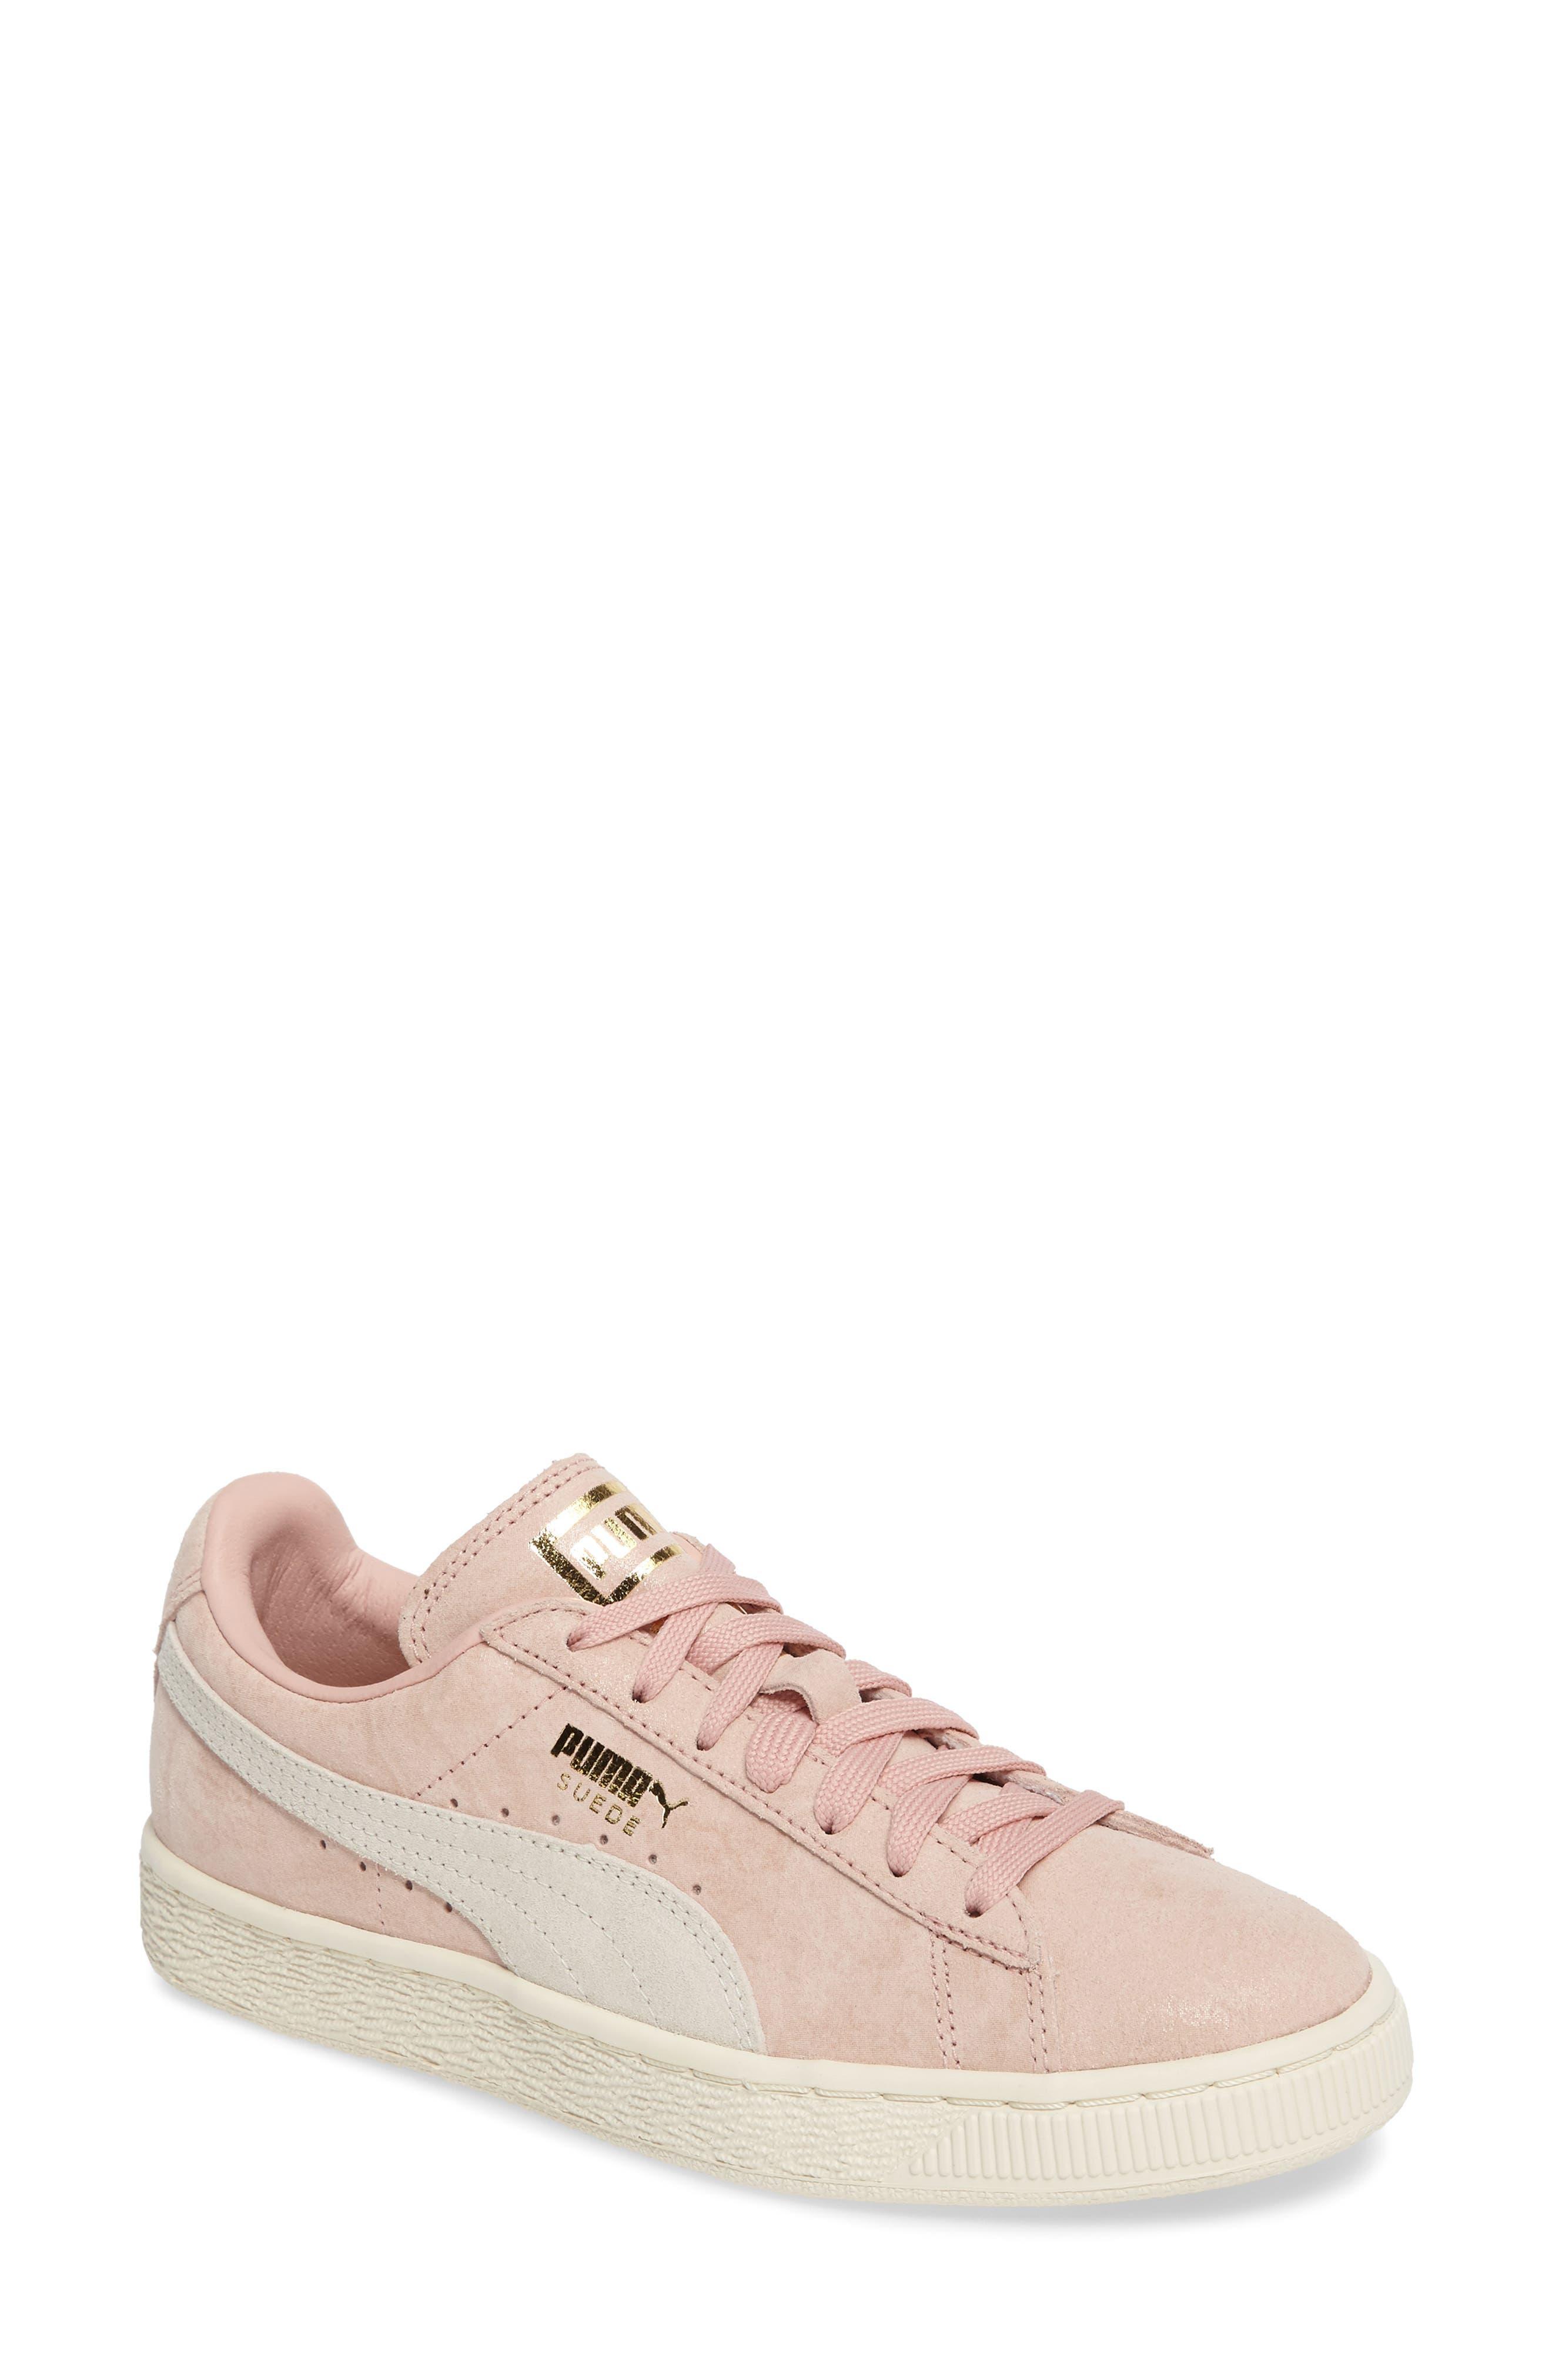 PUMA Suede Classic Shine Sneaker (Women)